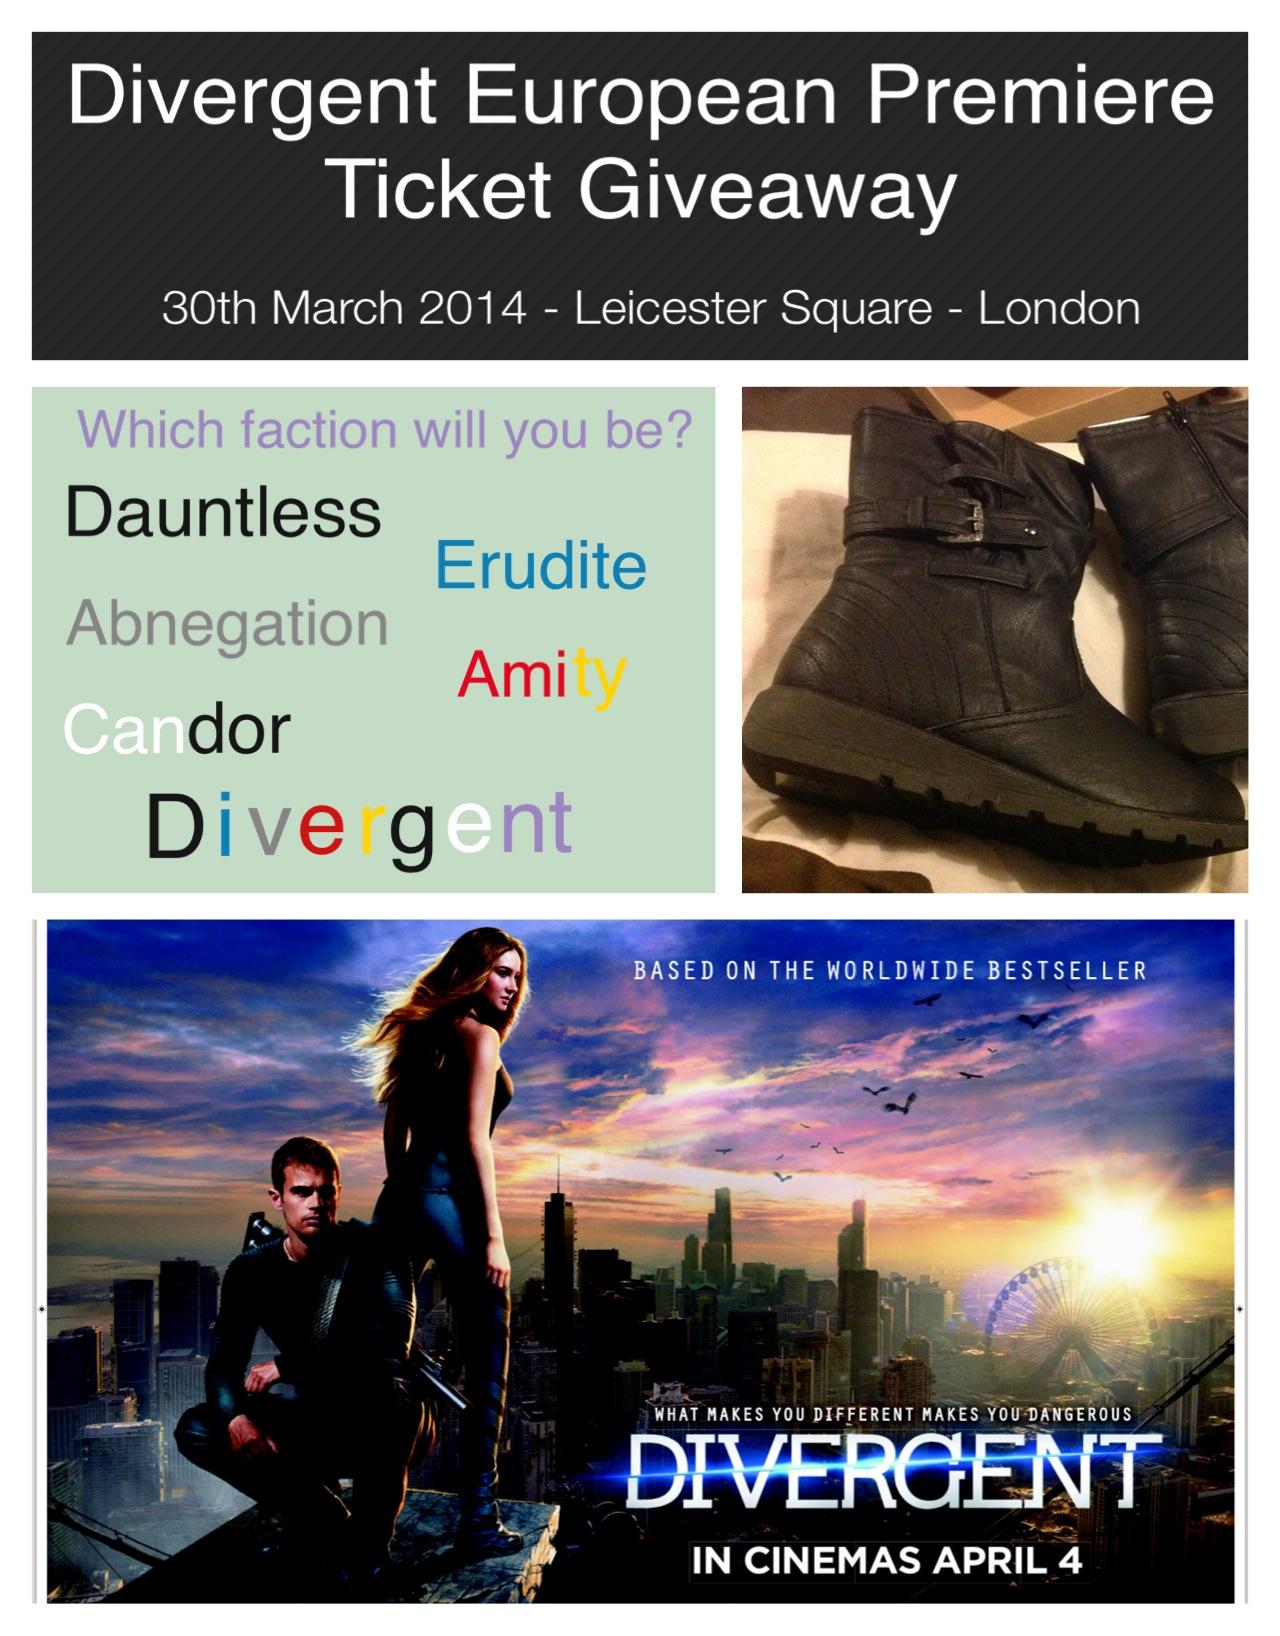 Dauntless giveaway